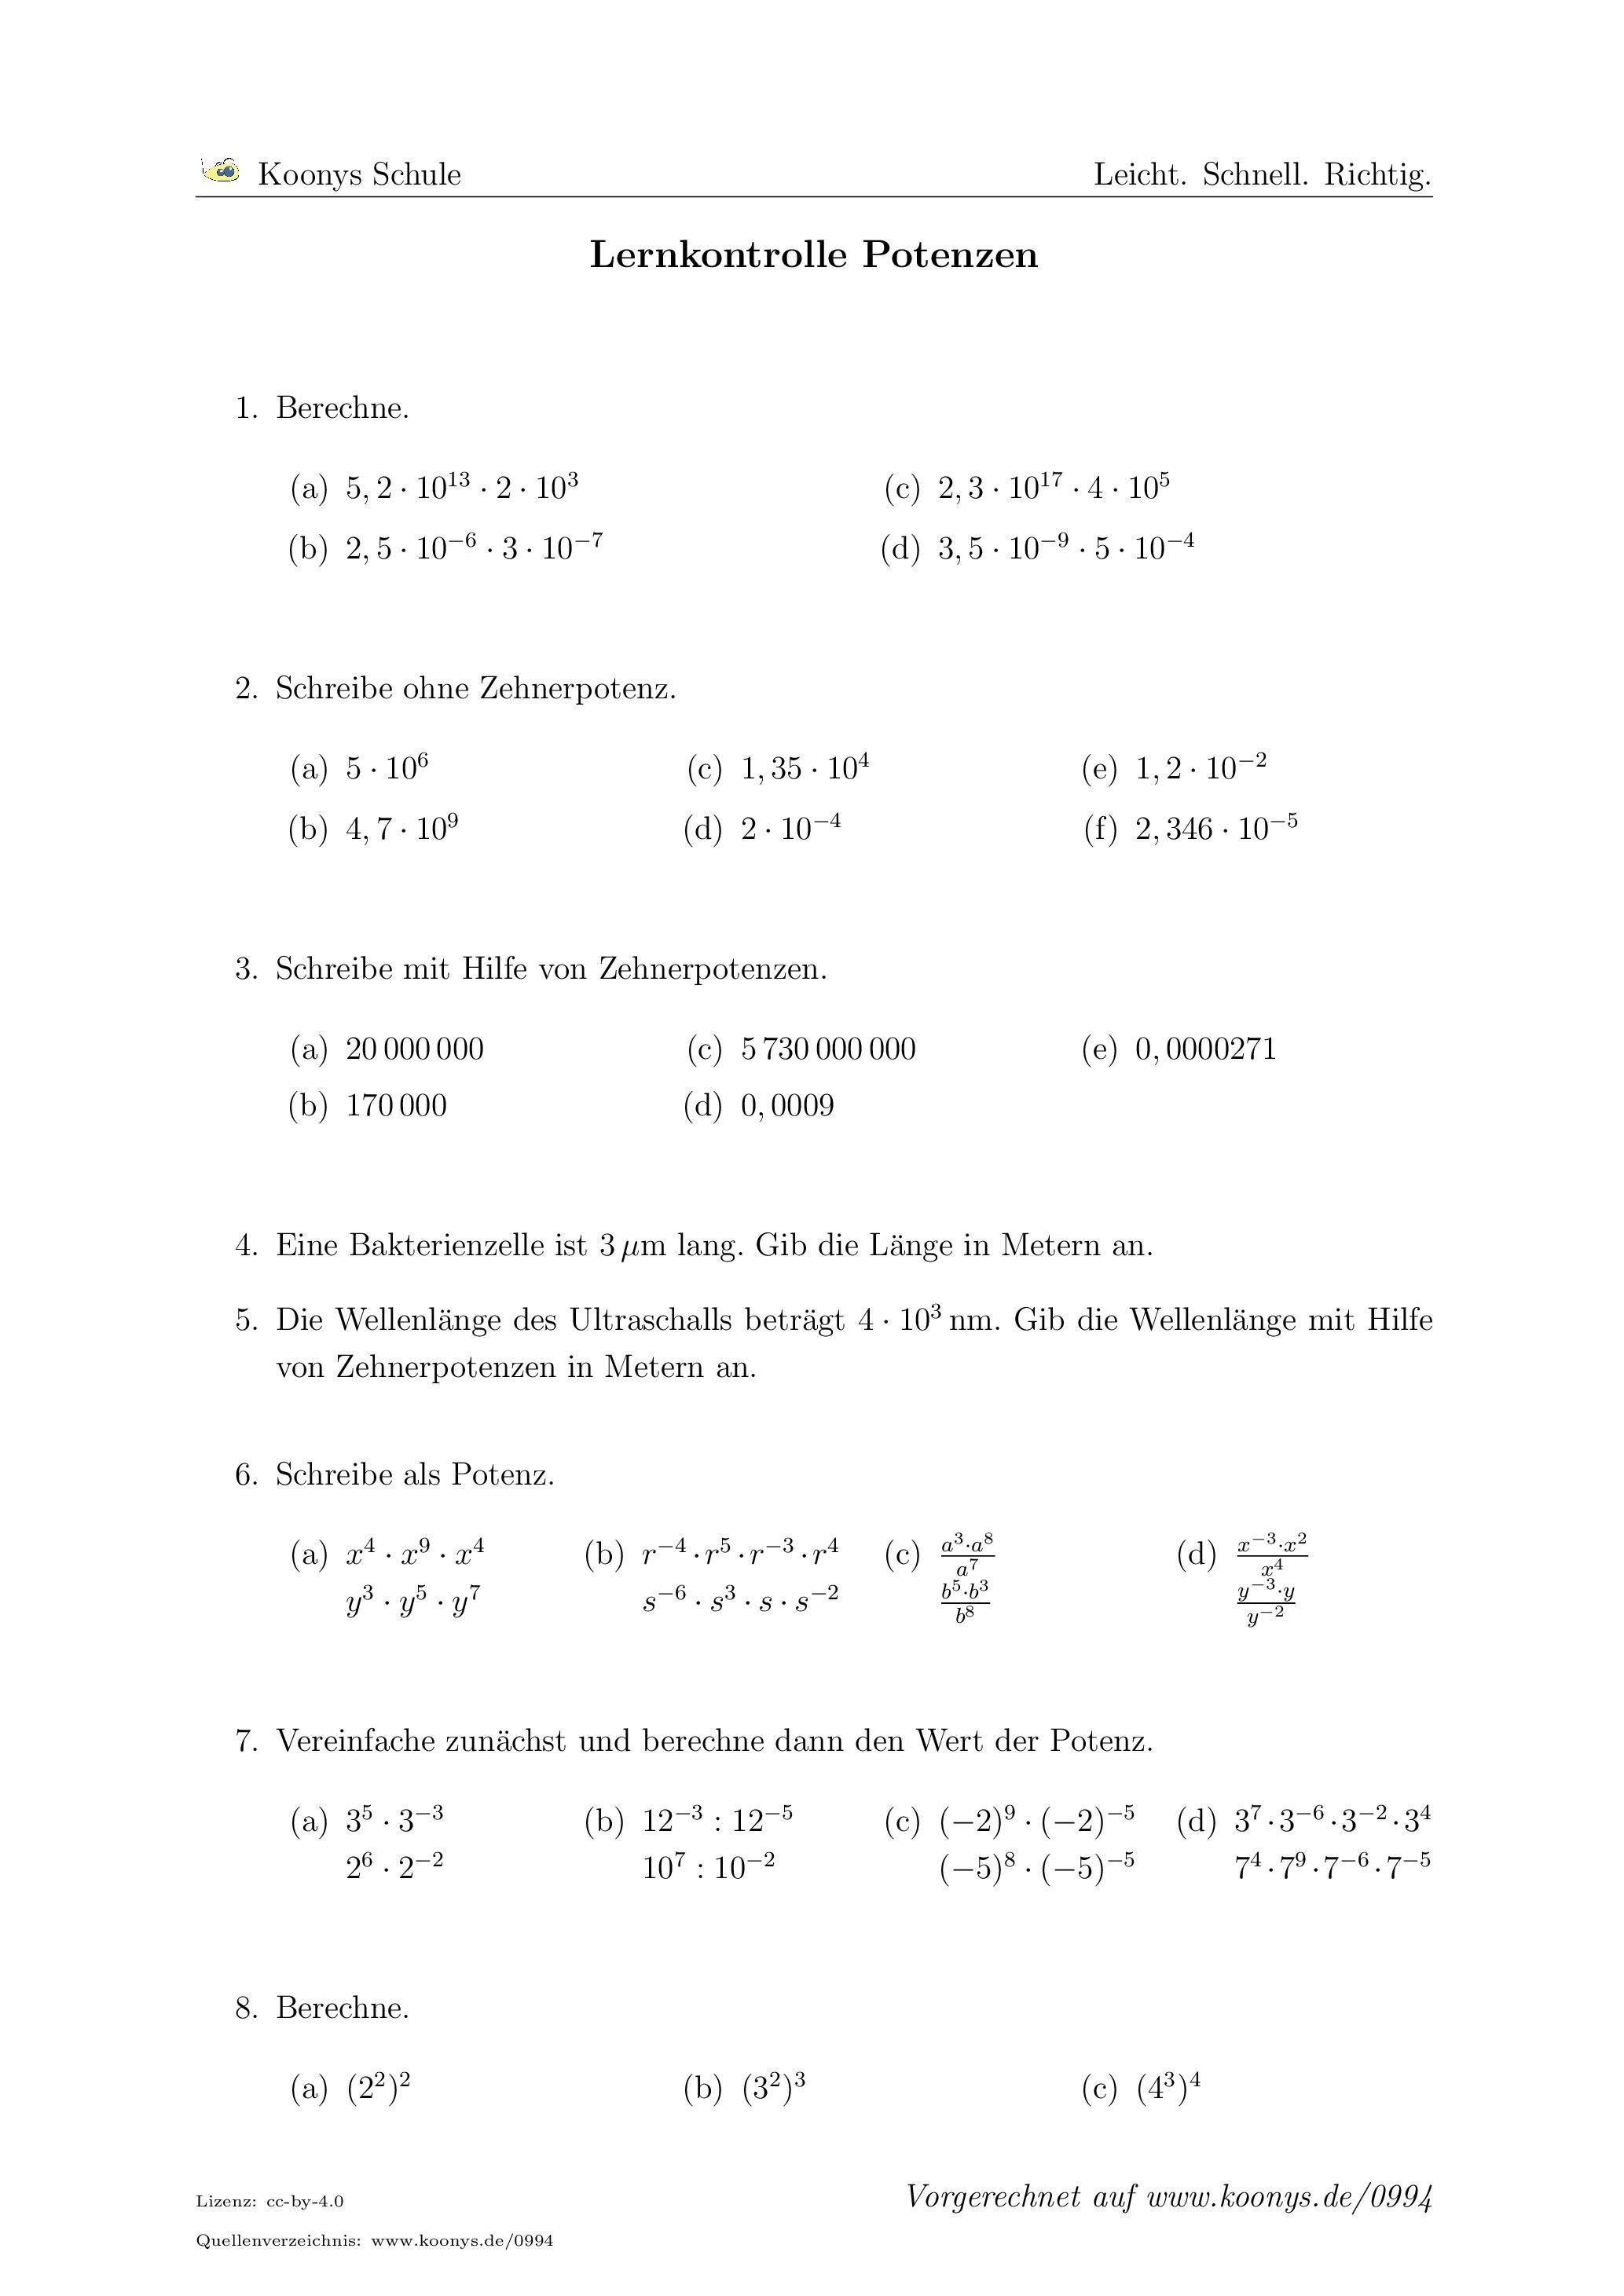 Lernkontrolle Potenzen | Arbeitsblatt #0994 | Mathe | Pinterest ...